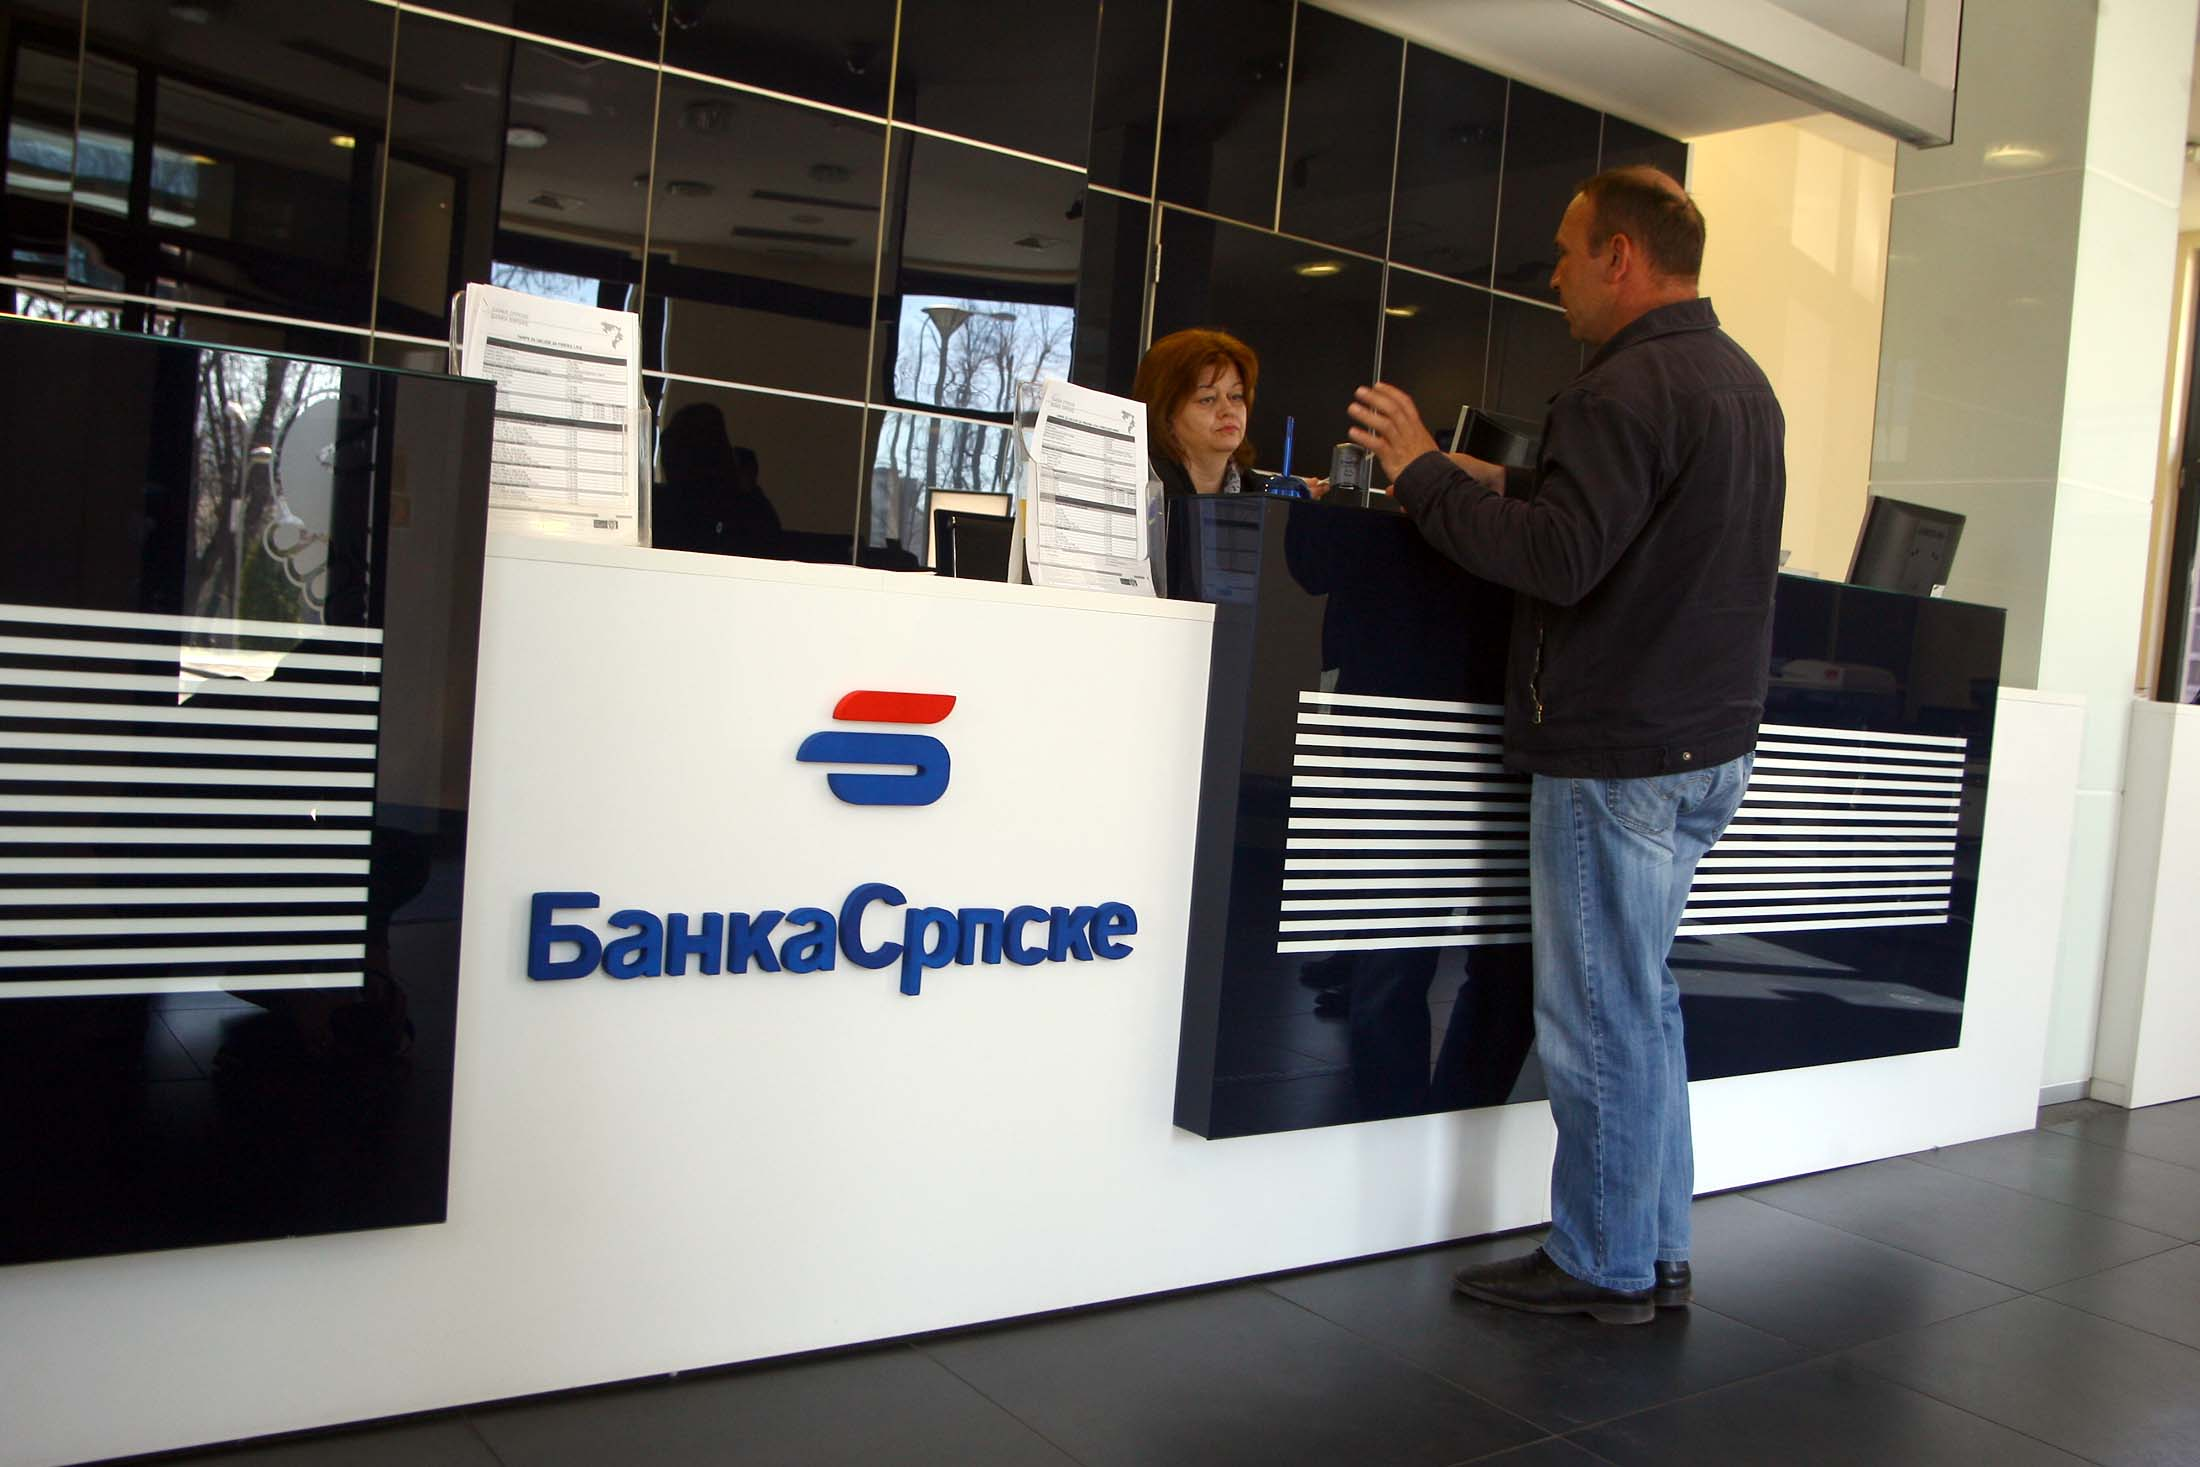 Novi izgled Banke Srpske